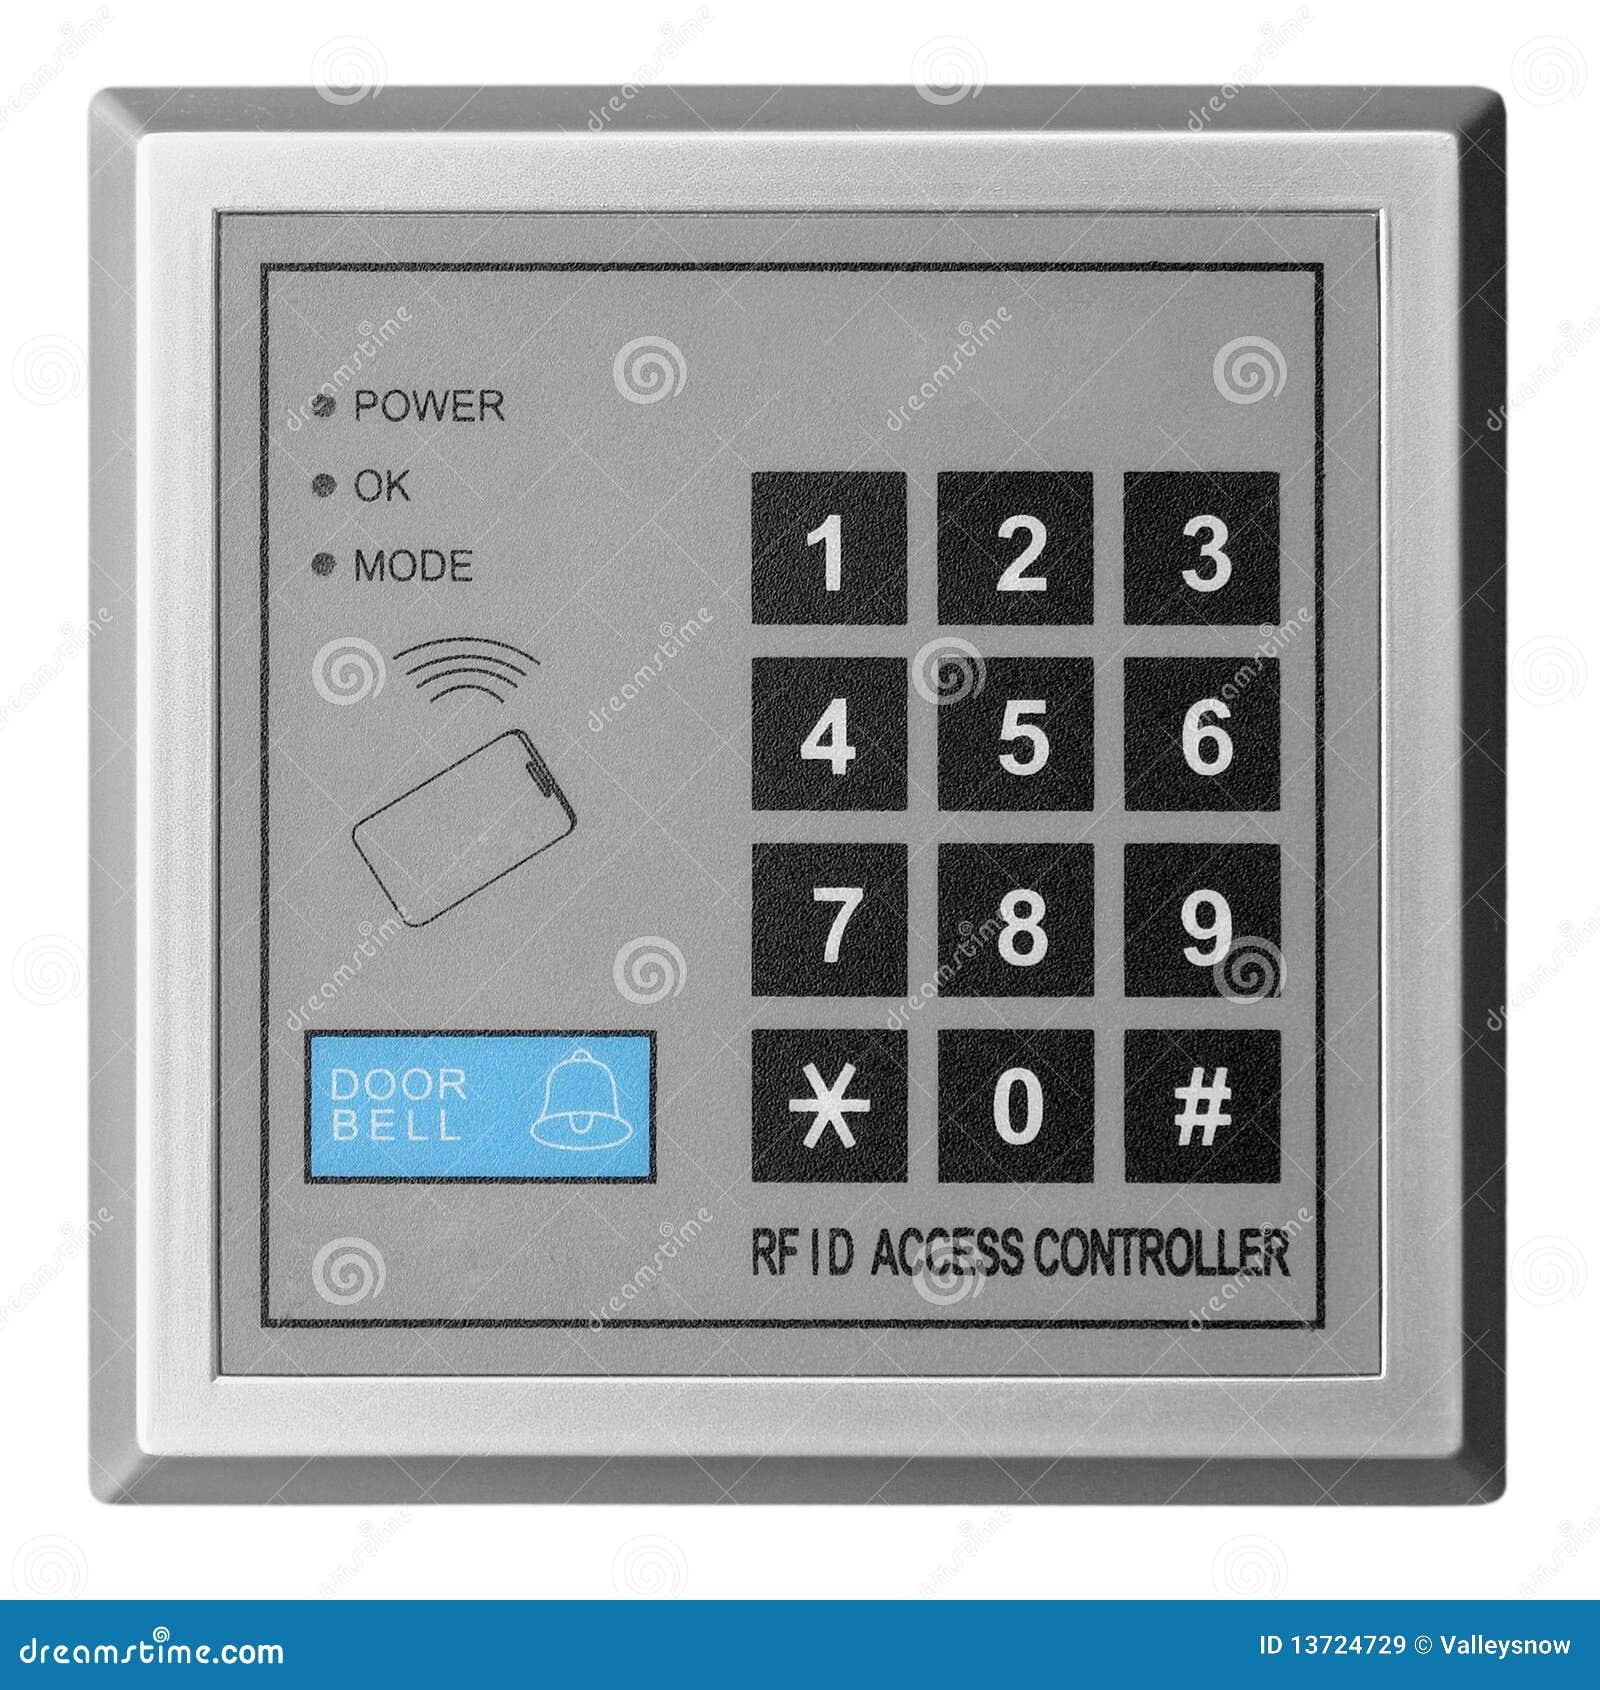 Door access controller royalty free stock images image for Door access controller